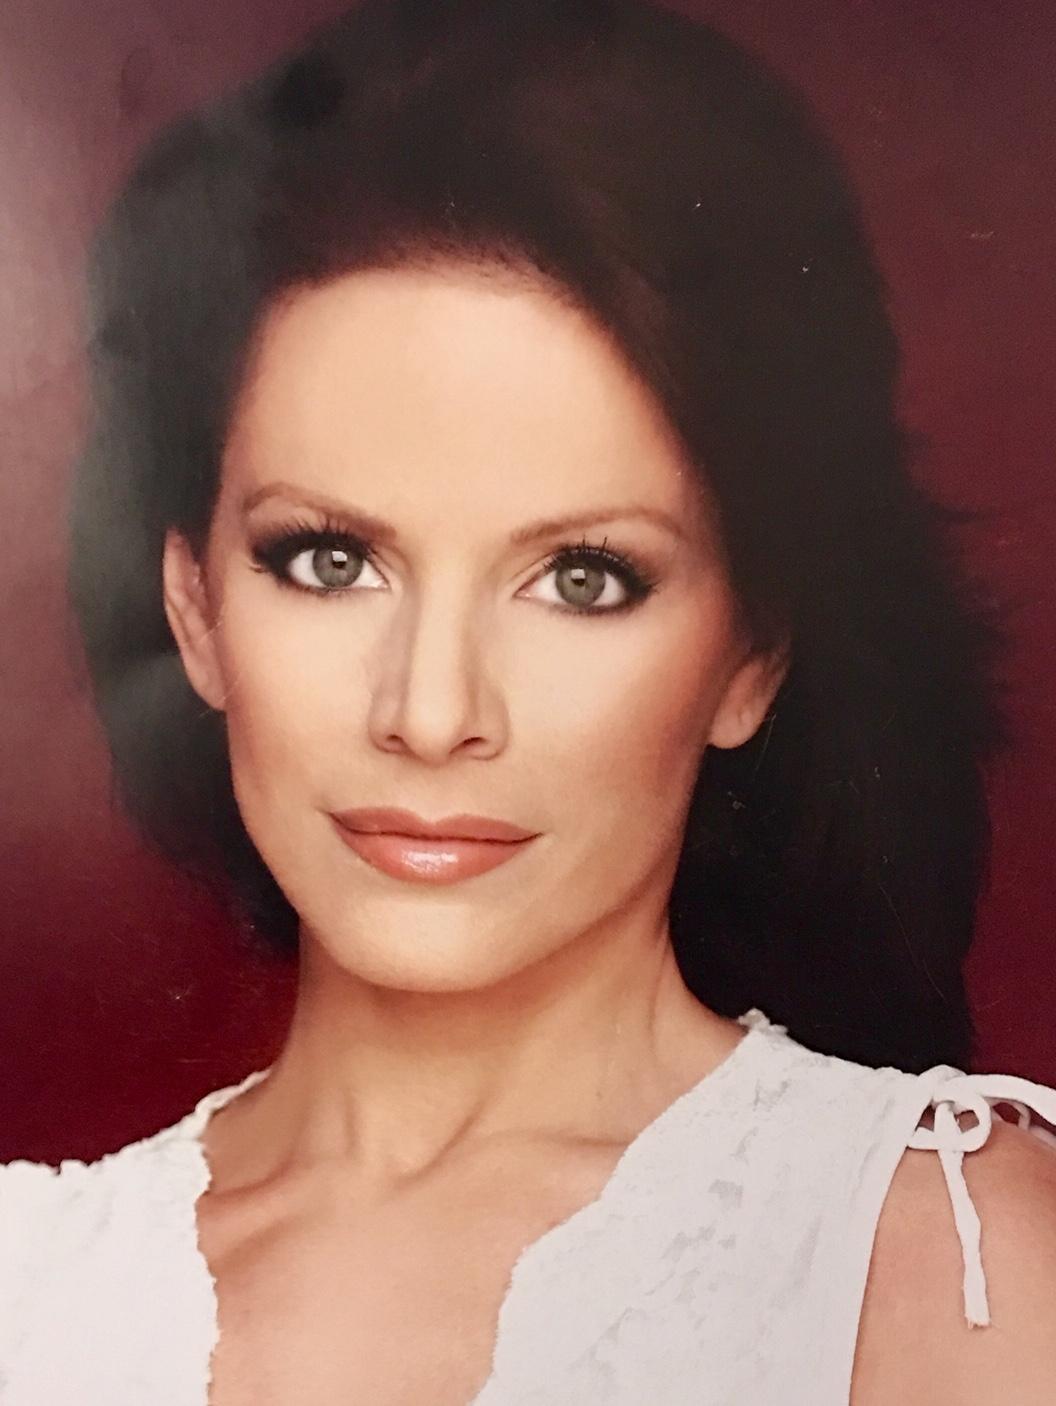 Annette S. Model + Actress